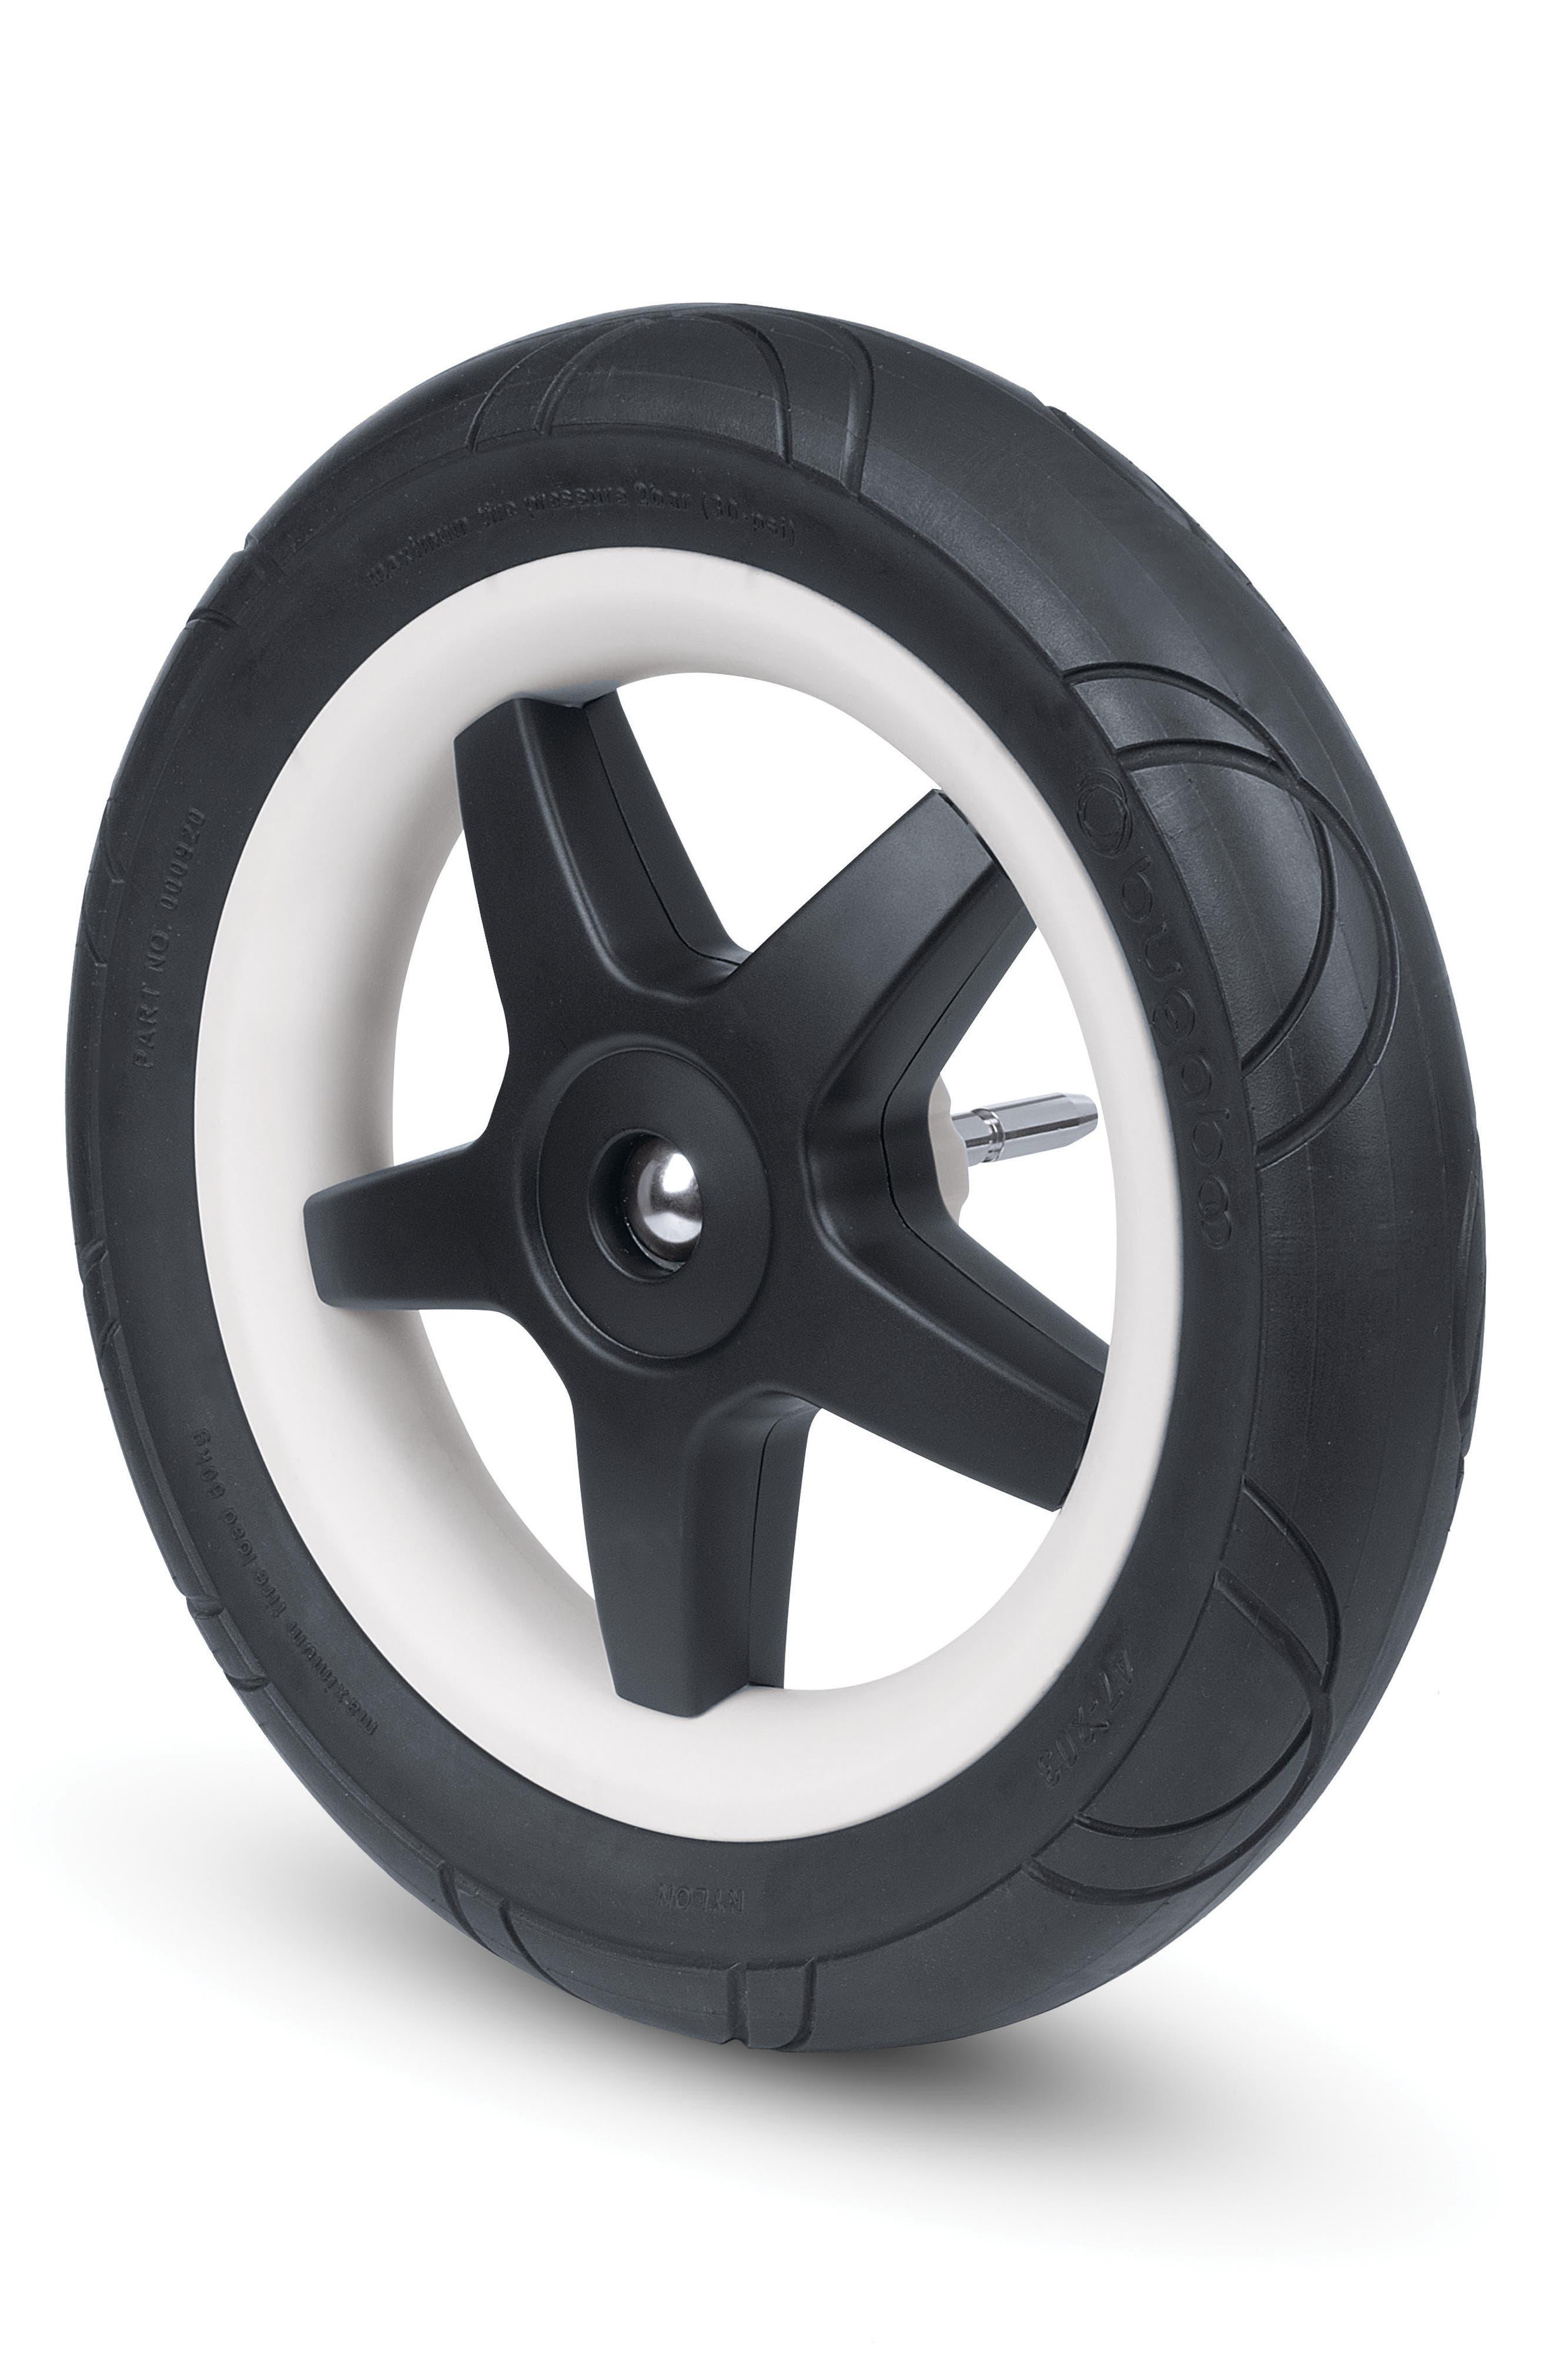 4-Piece Foam Wheel Set for Donkey Series Strollers,                         Main,                         color, Black